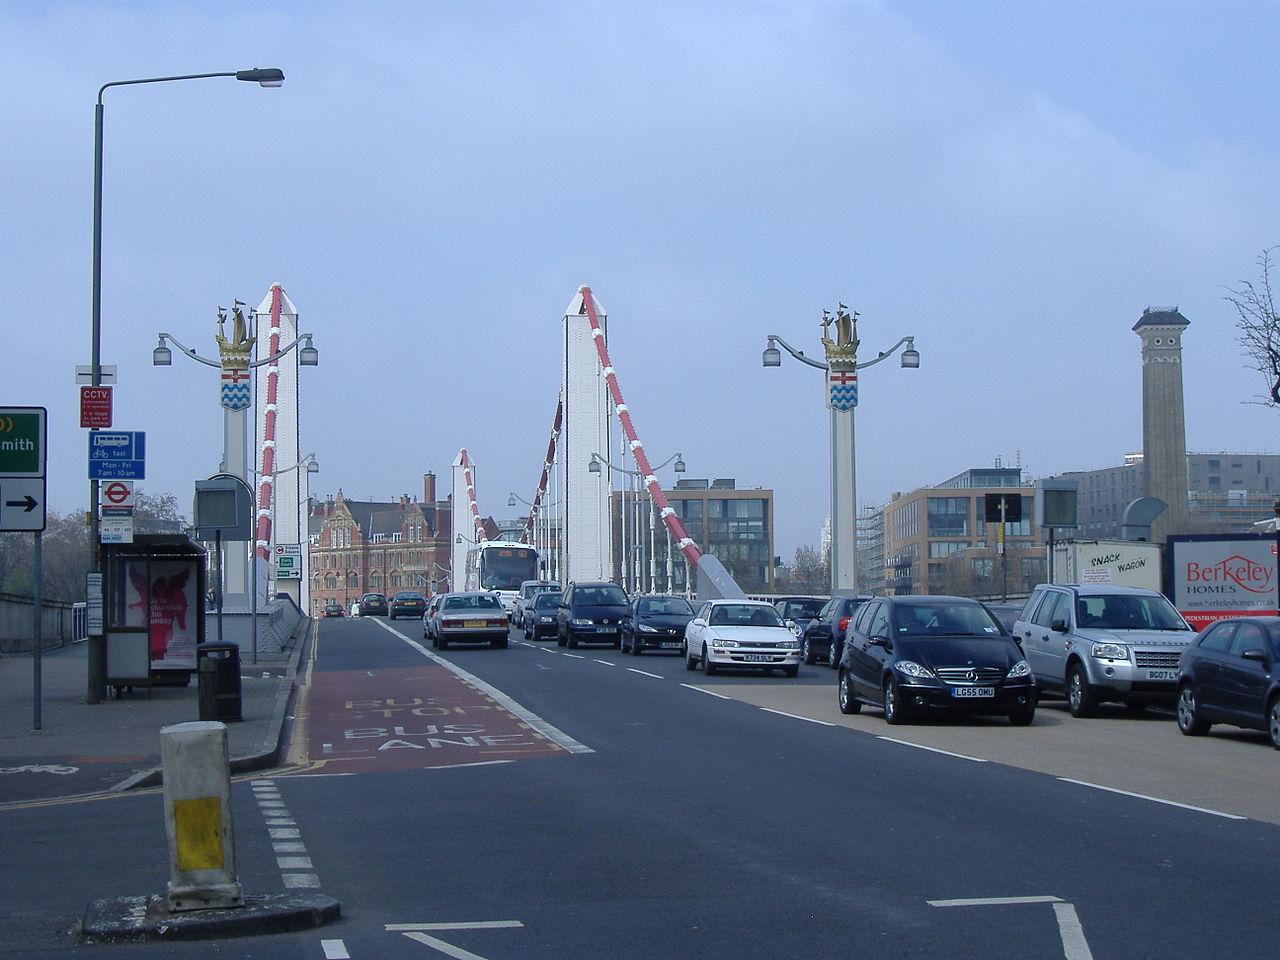 1280px-Chelsea_Bridge_traffic